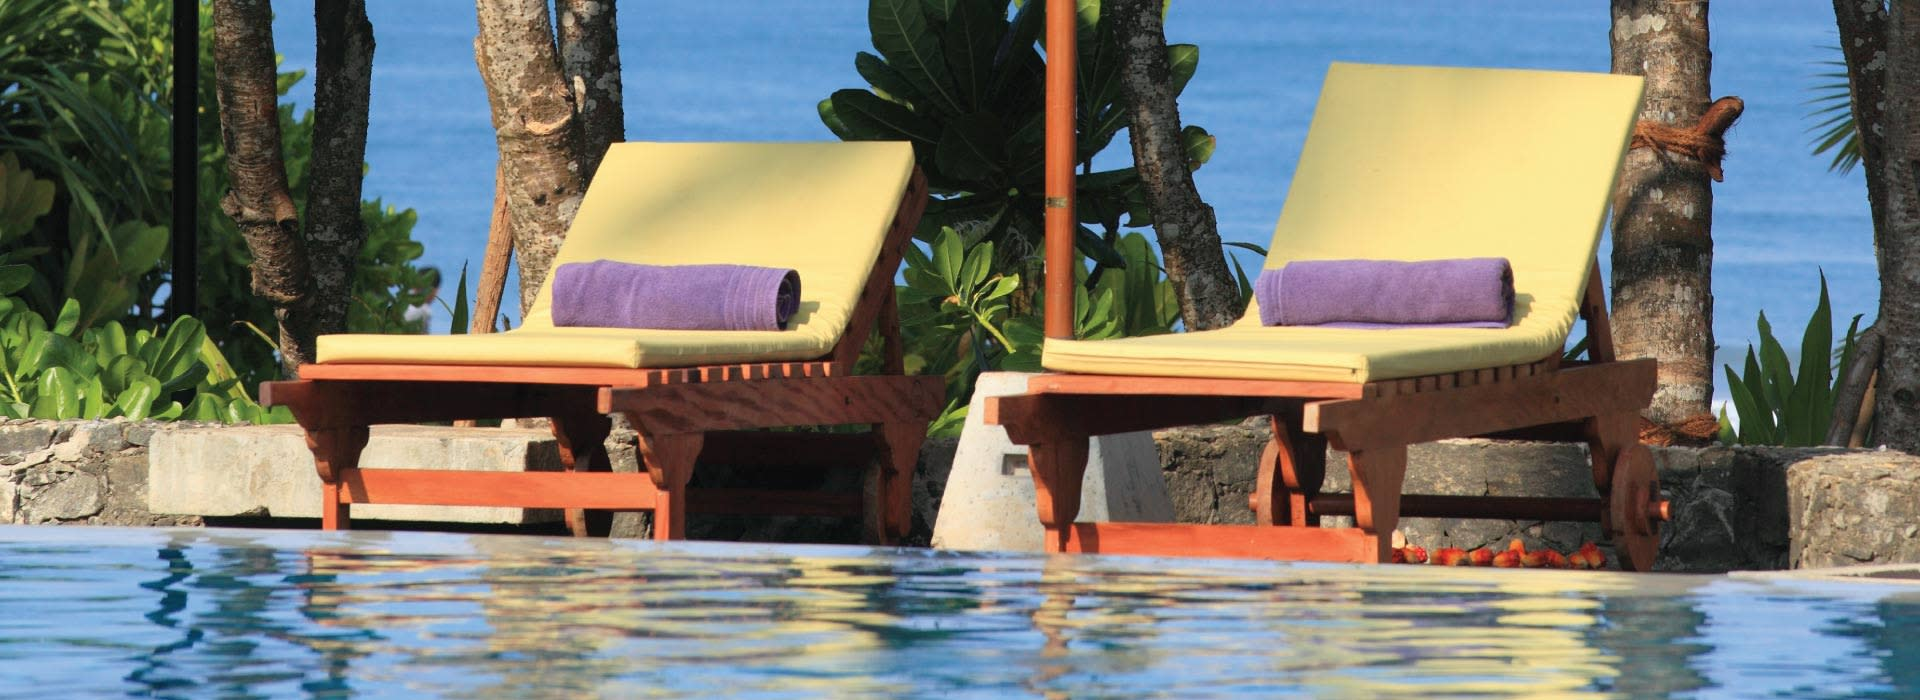 Sri Lanka Hotel Deals for beach lovers